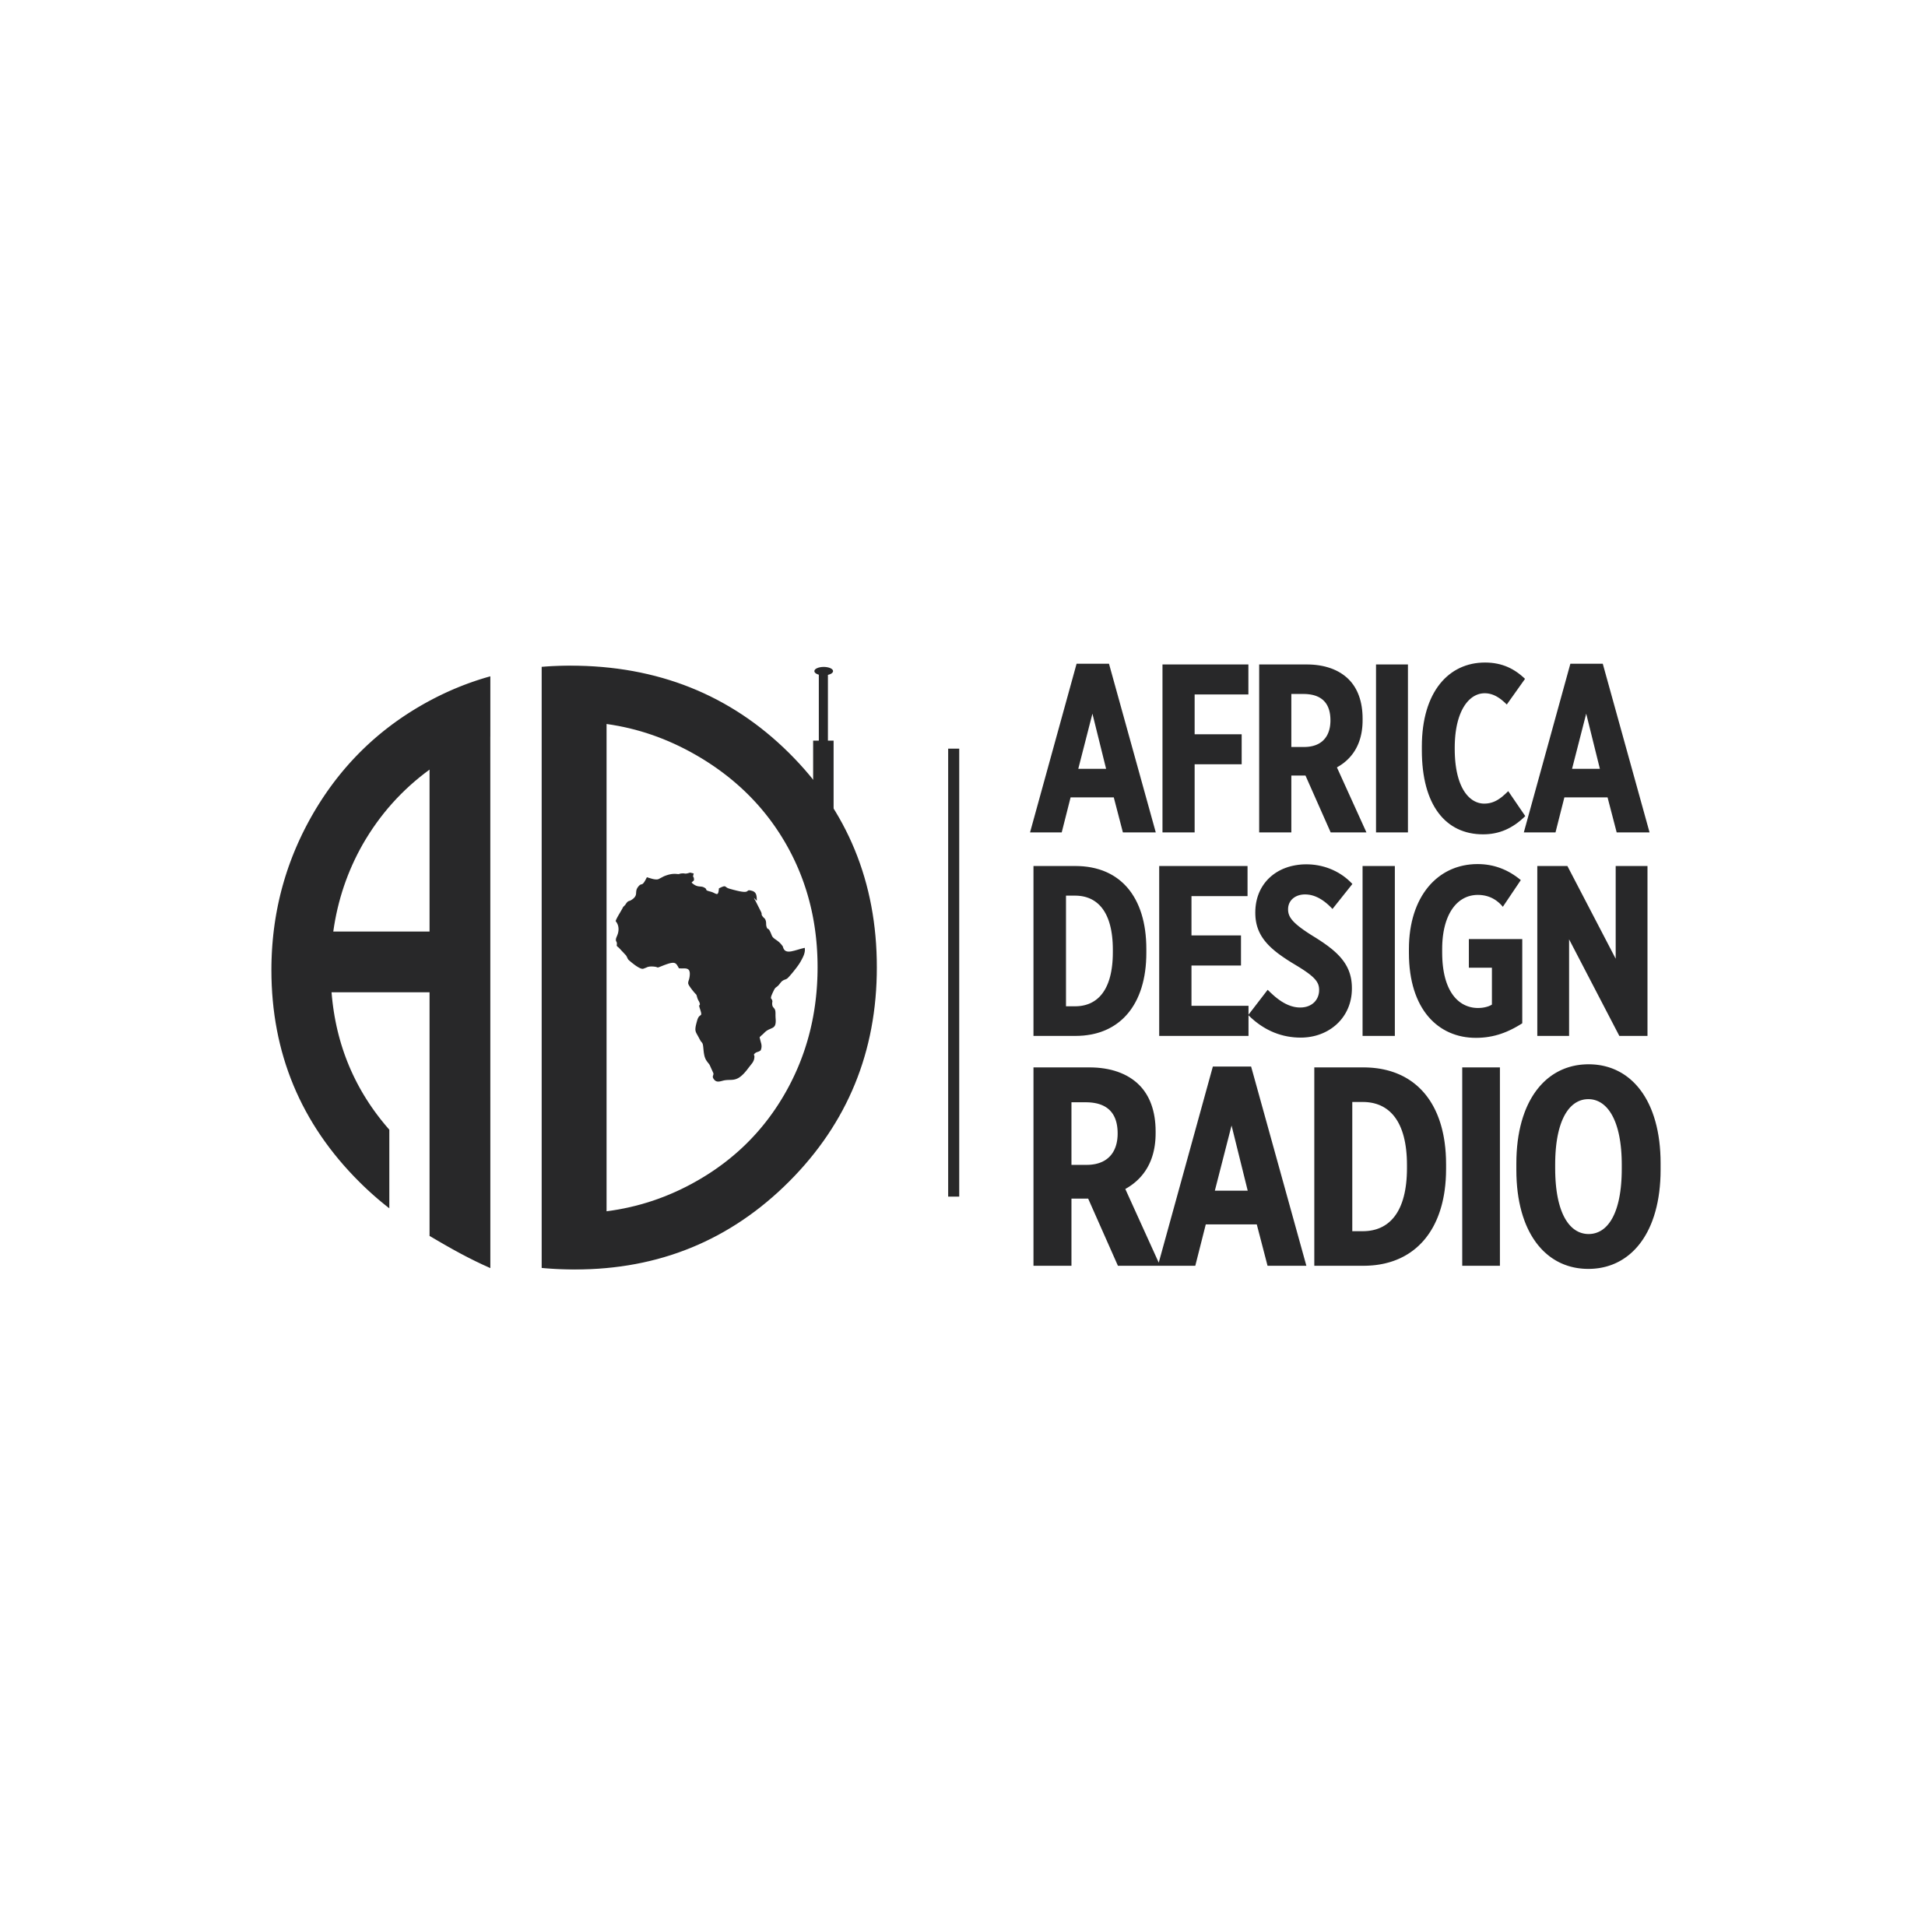 @africadesignradio Profile Image | Linktree